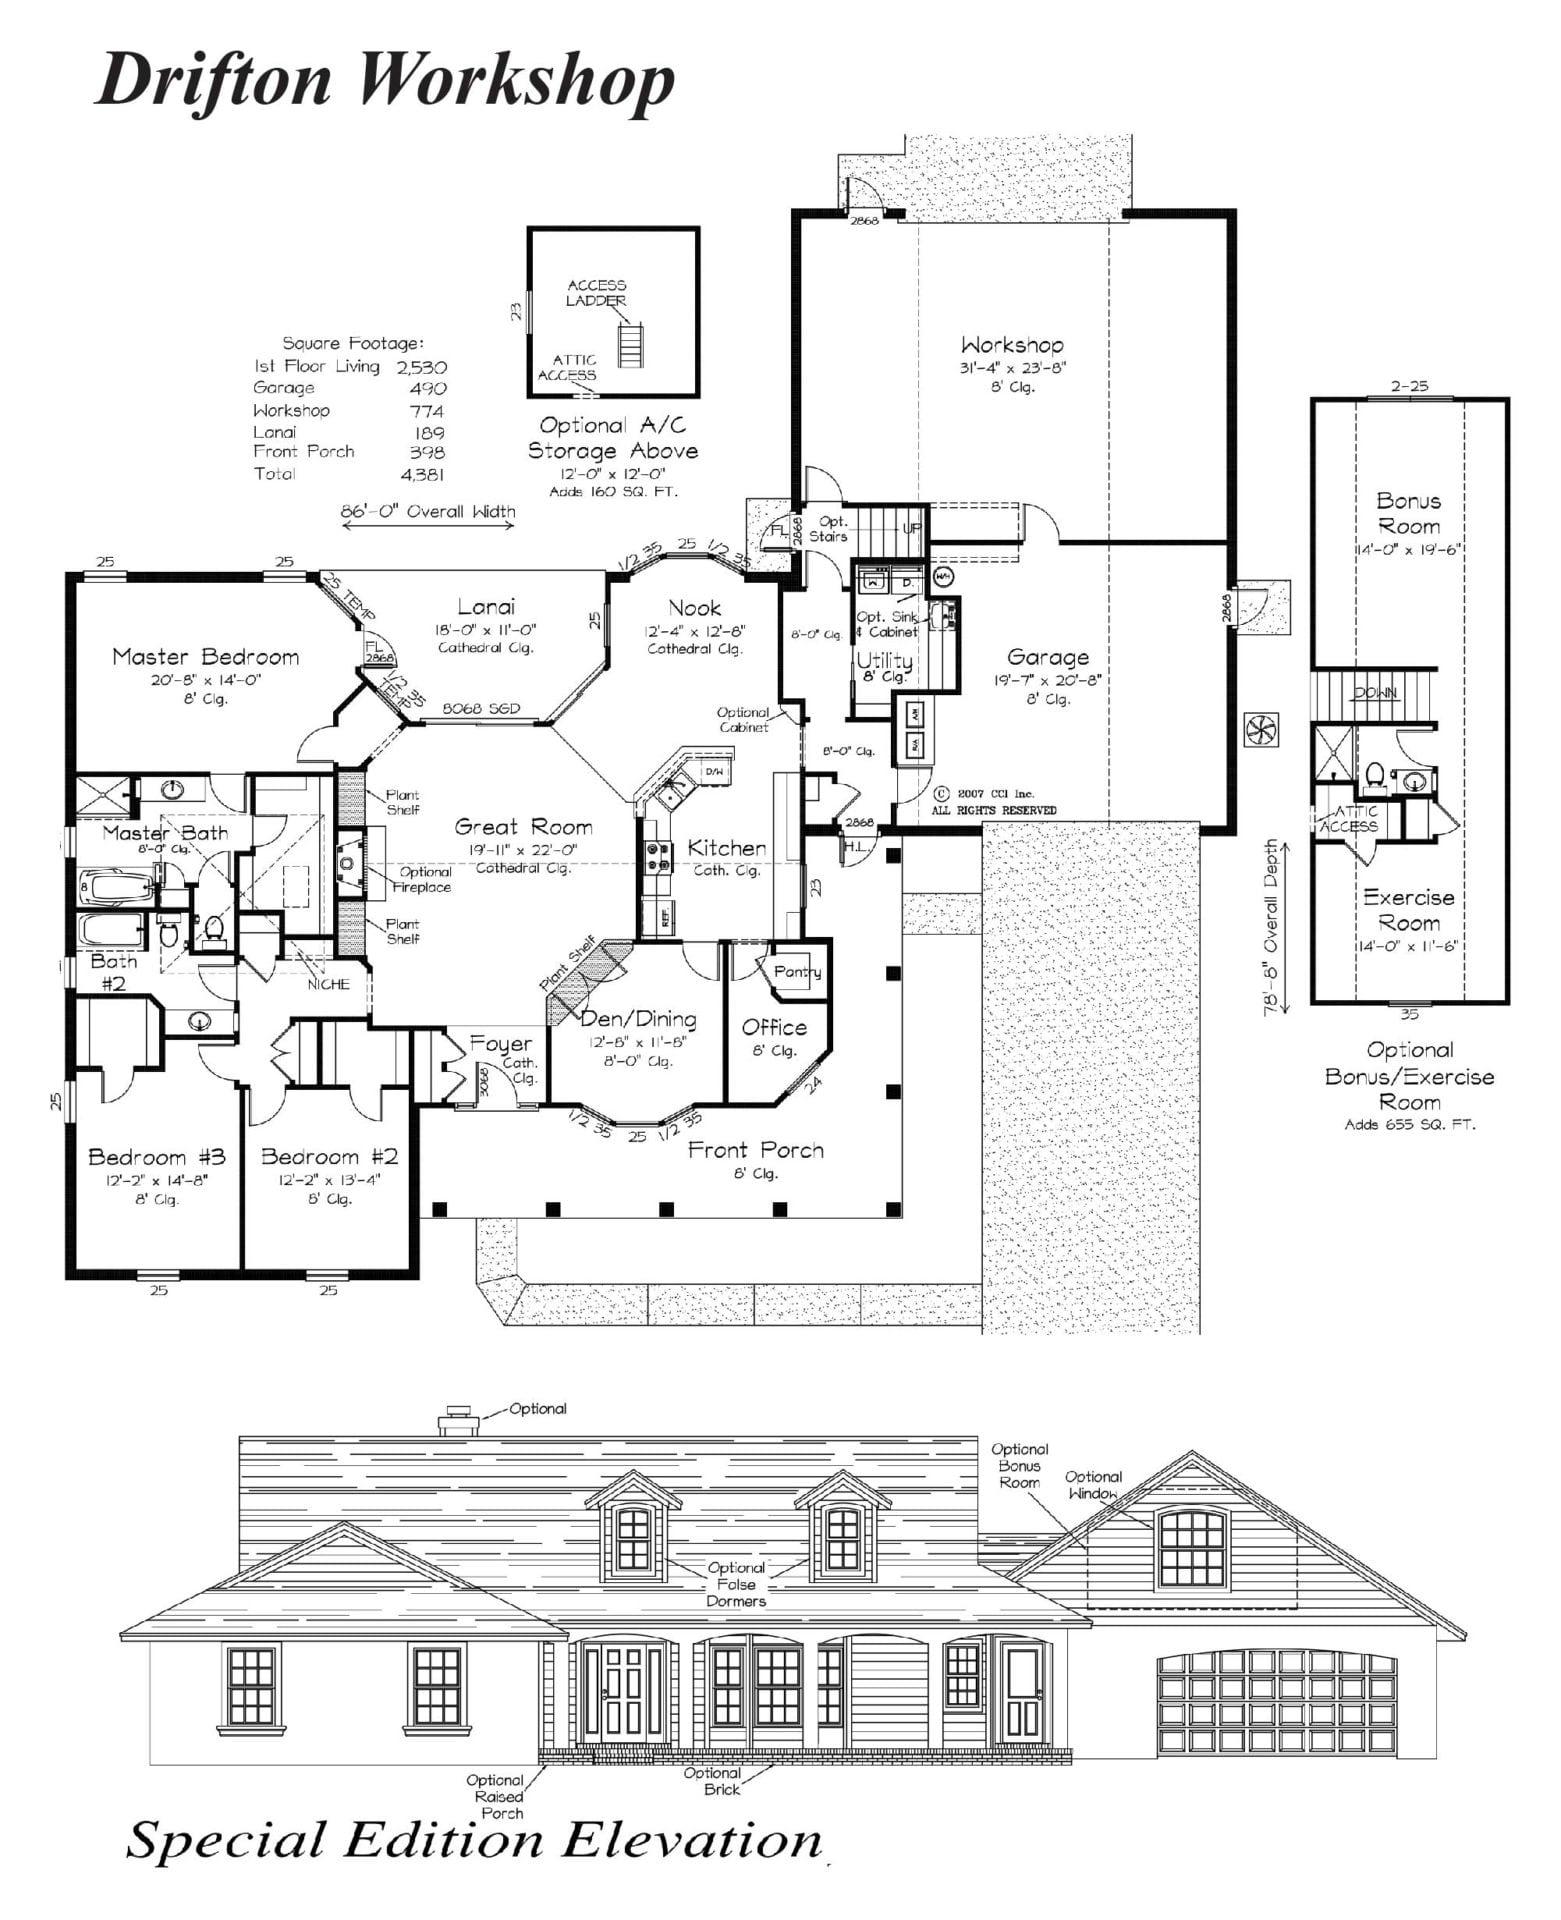 Drifton Workshop - Floor Plan - Curington Homes - Ocala Florida Contractor